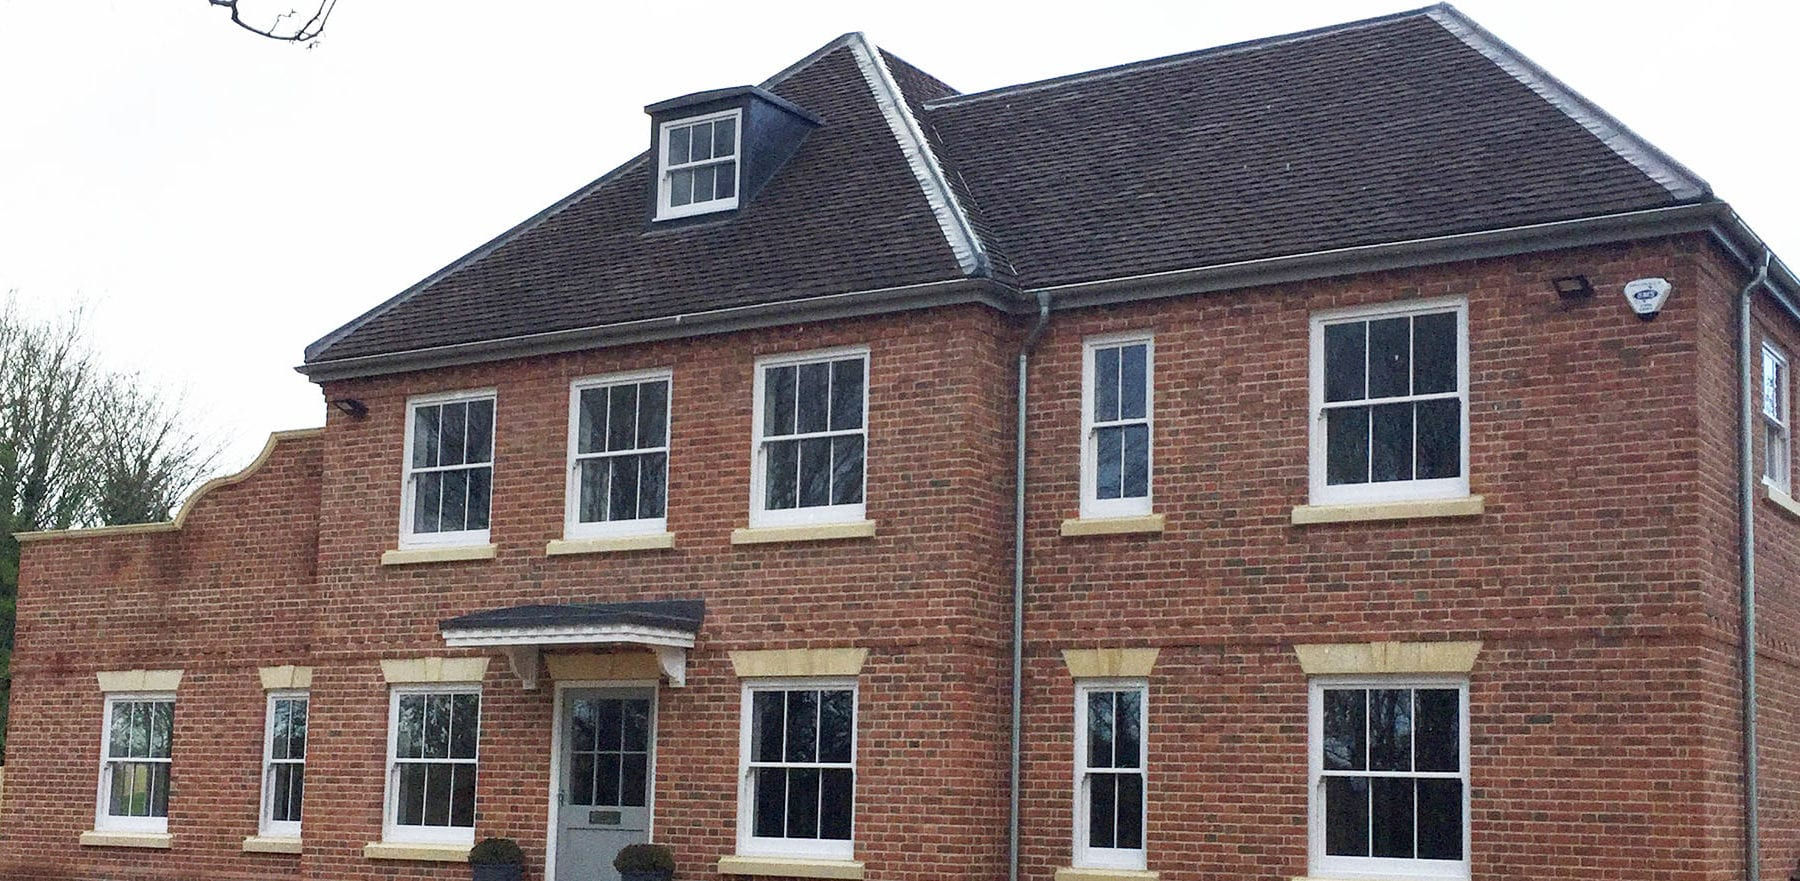 Lifestiles - Handmade Restoration Clay Roof Tiles - Creed, England 7